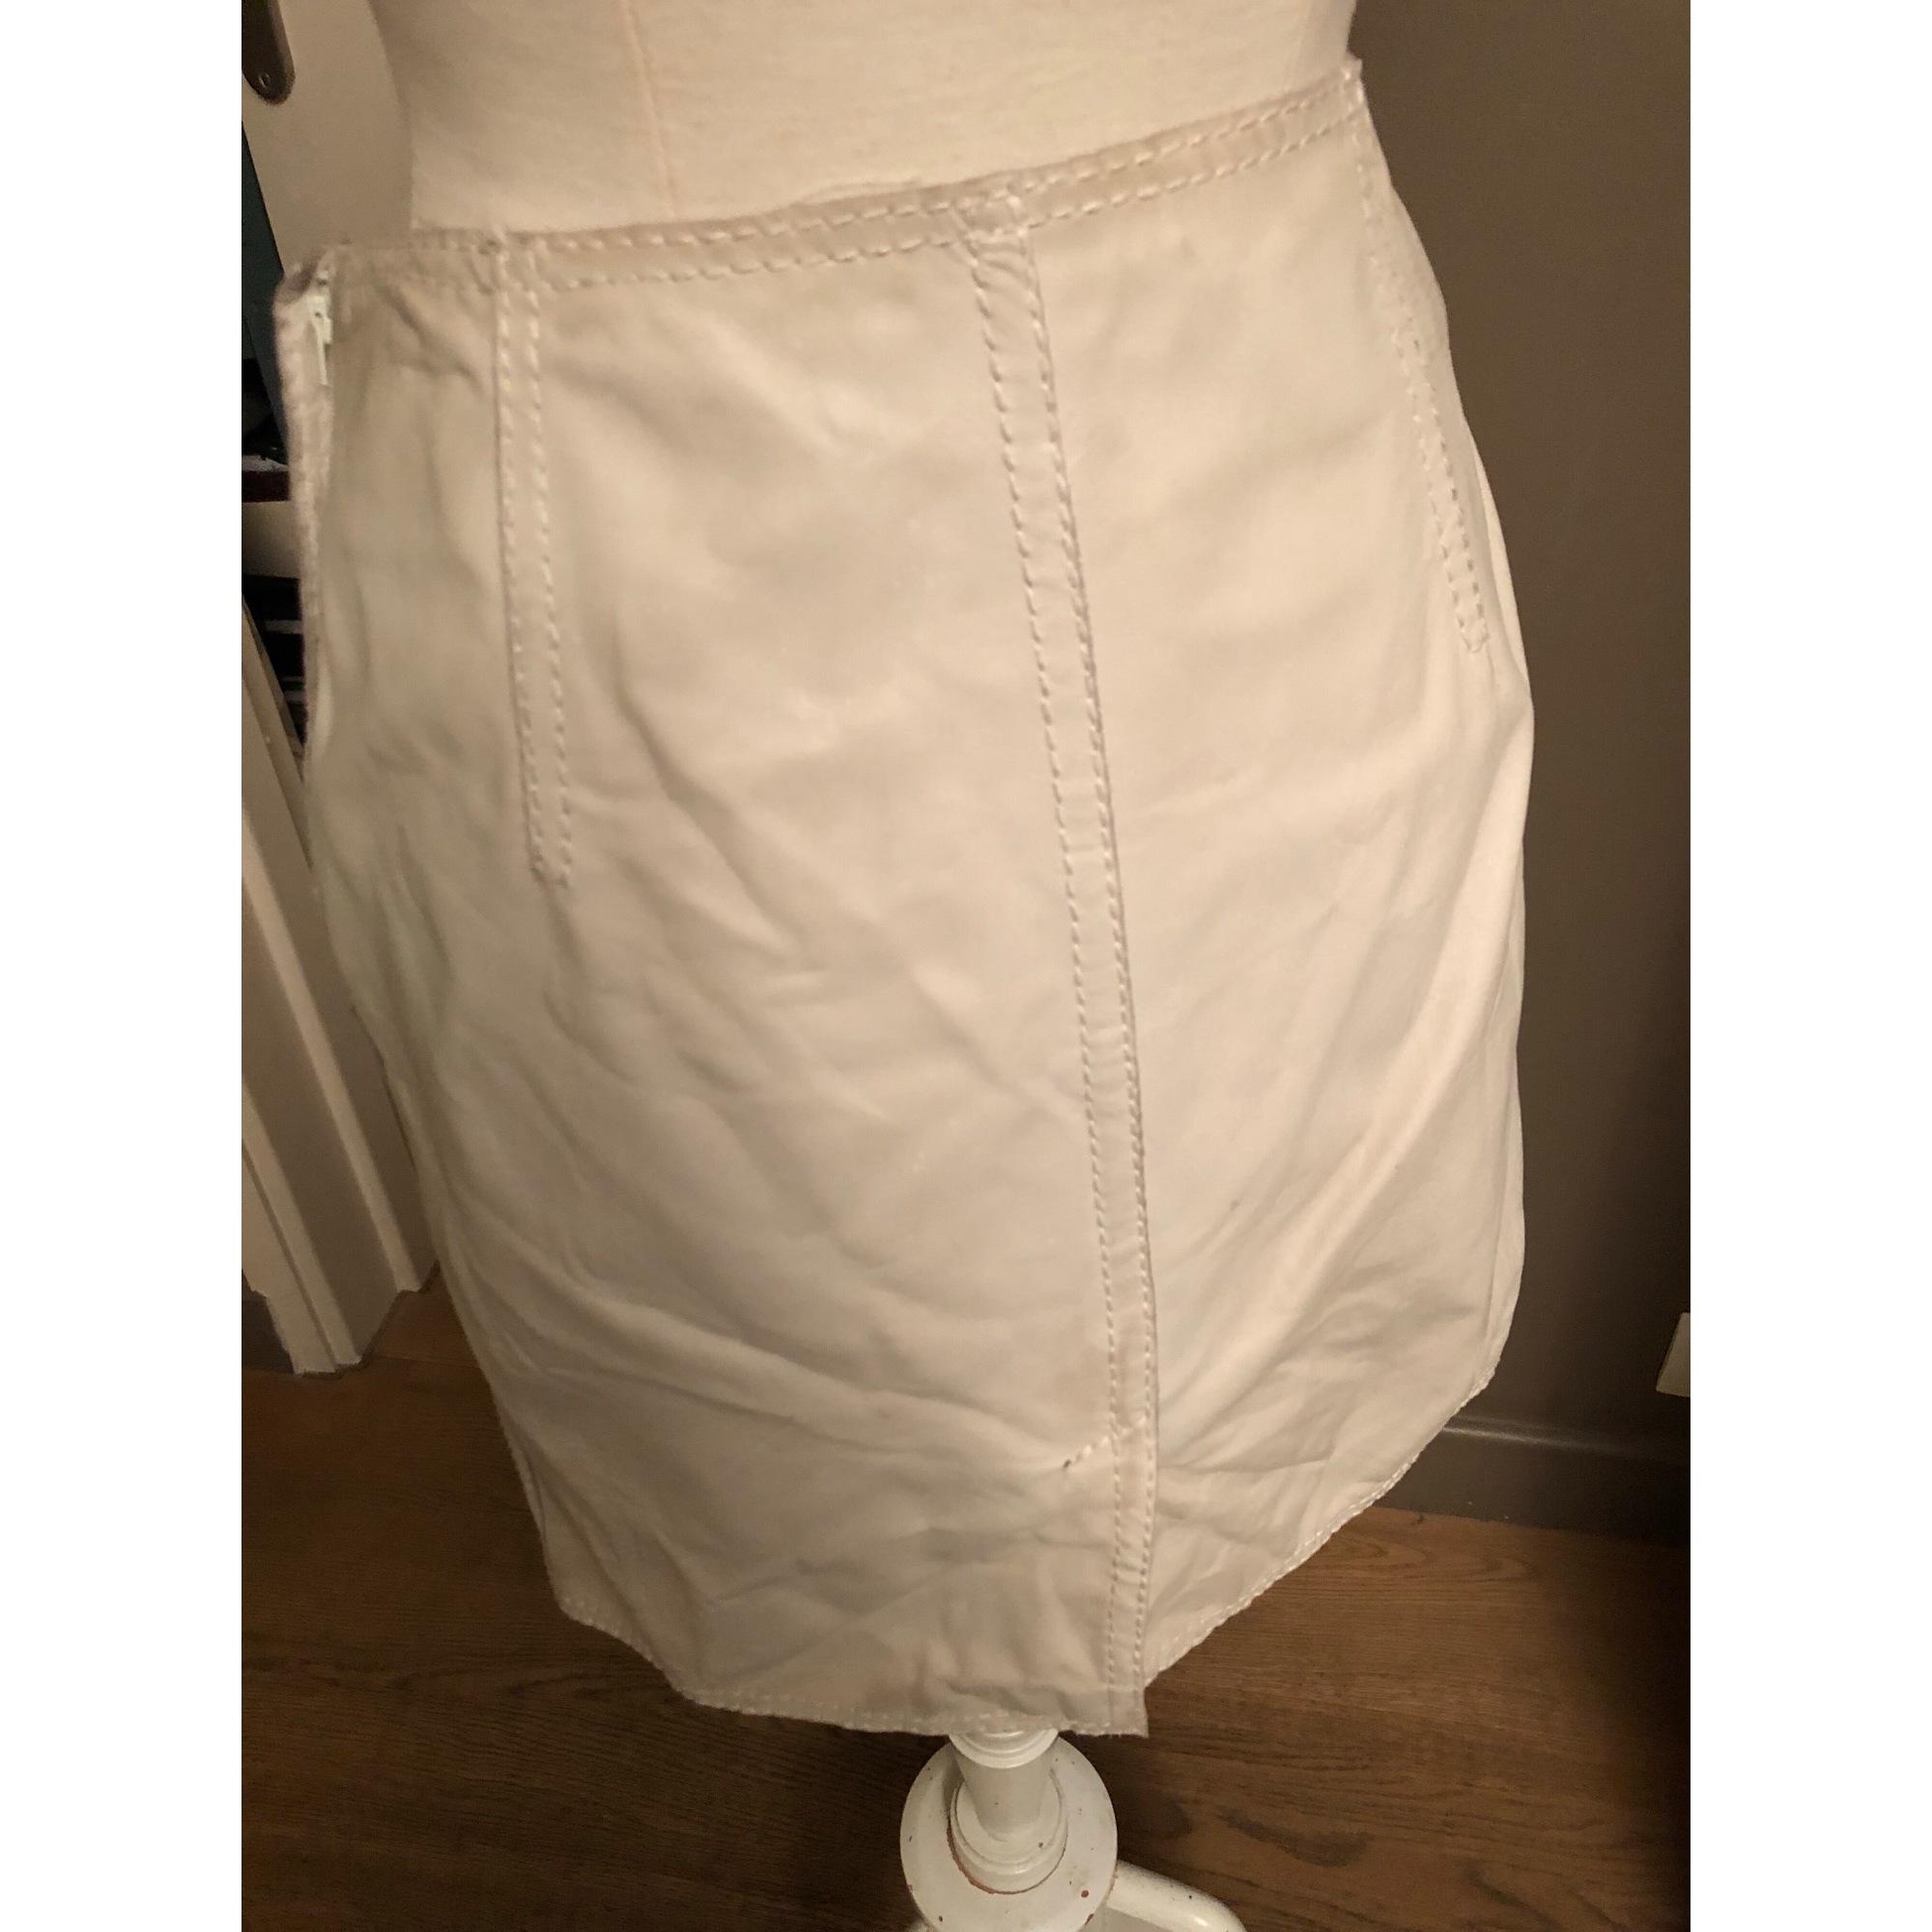 Jupe mi-longue SYLVIE SCHIMMEL Blanc, blanc cassé, écru